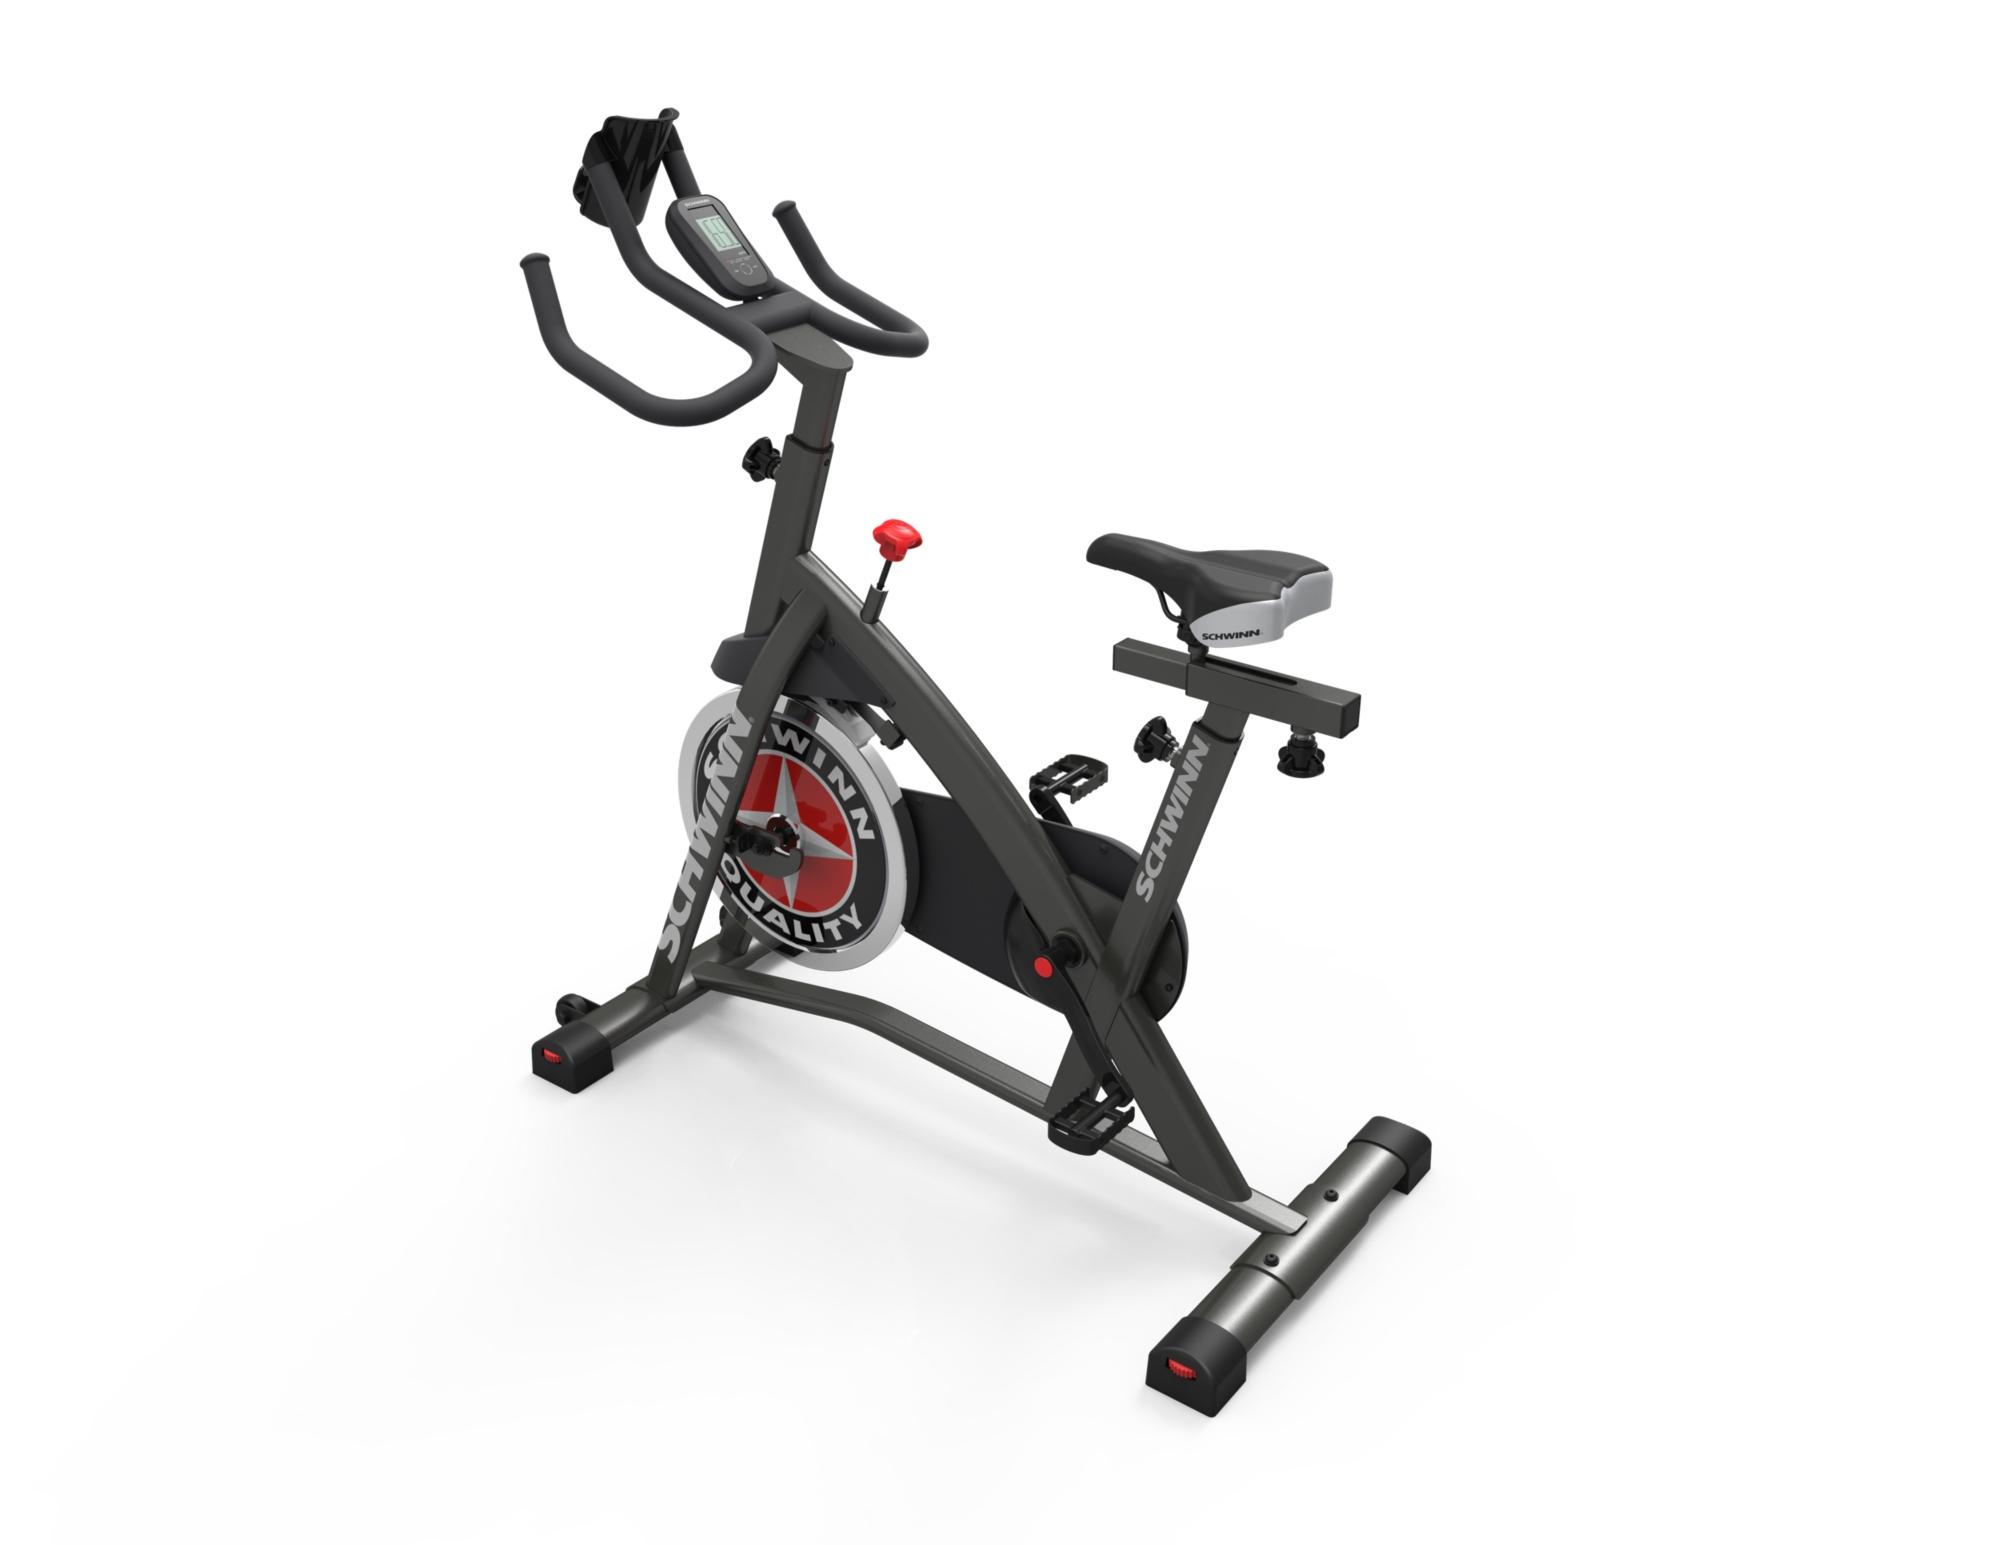 Schwinn 174 Ic2 Indoor Cycling Bike Schwinn 174